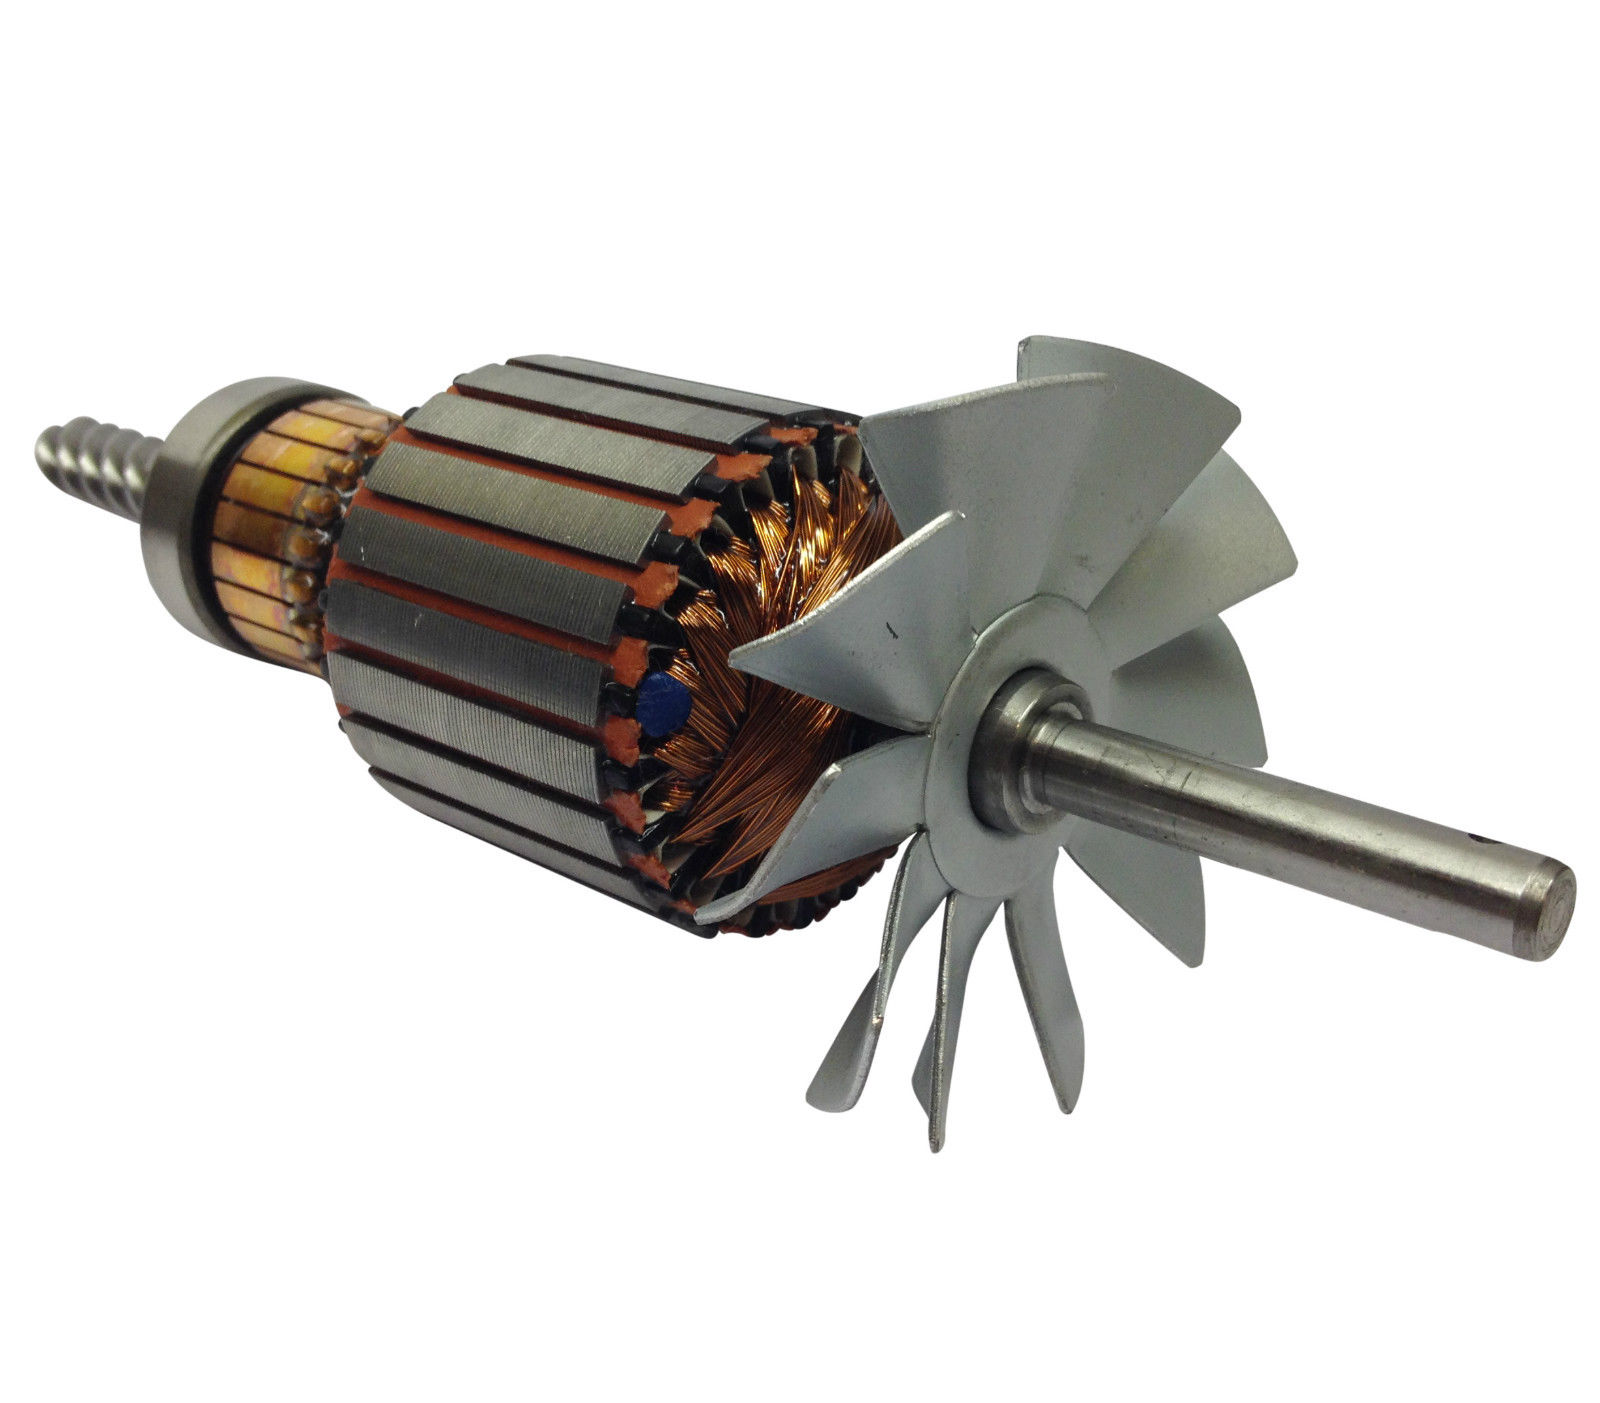 Kitchenaid Stand Mixer Armature Amp Motor Field Coil